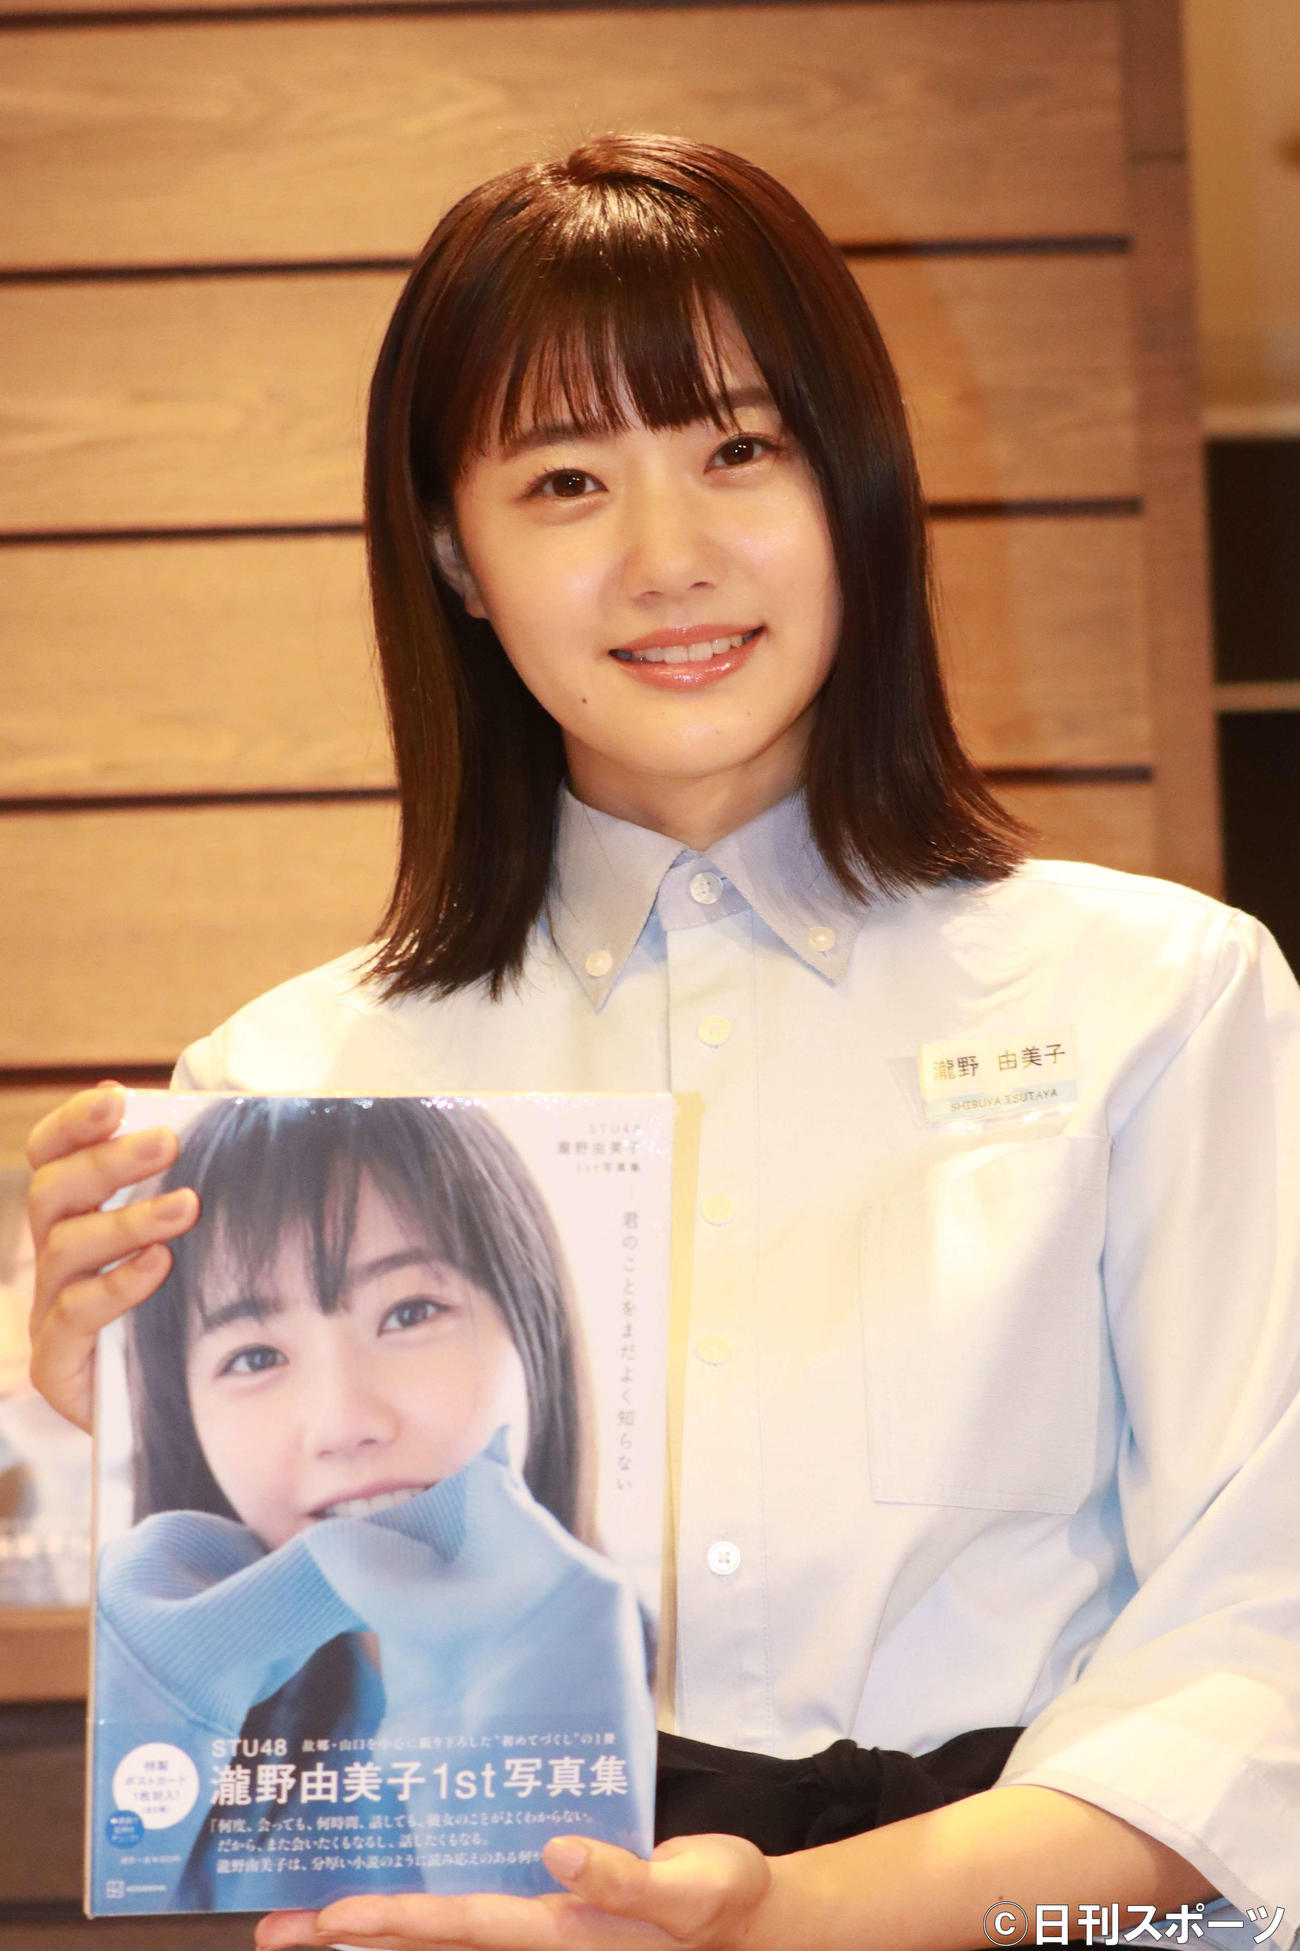 SHIBUYA TSUTAYAの一日店長に就任した瀧野由美子(撮影・勝部晃多)